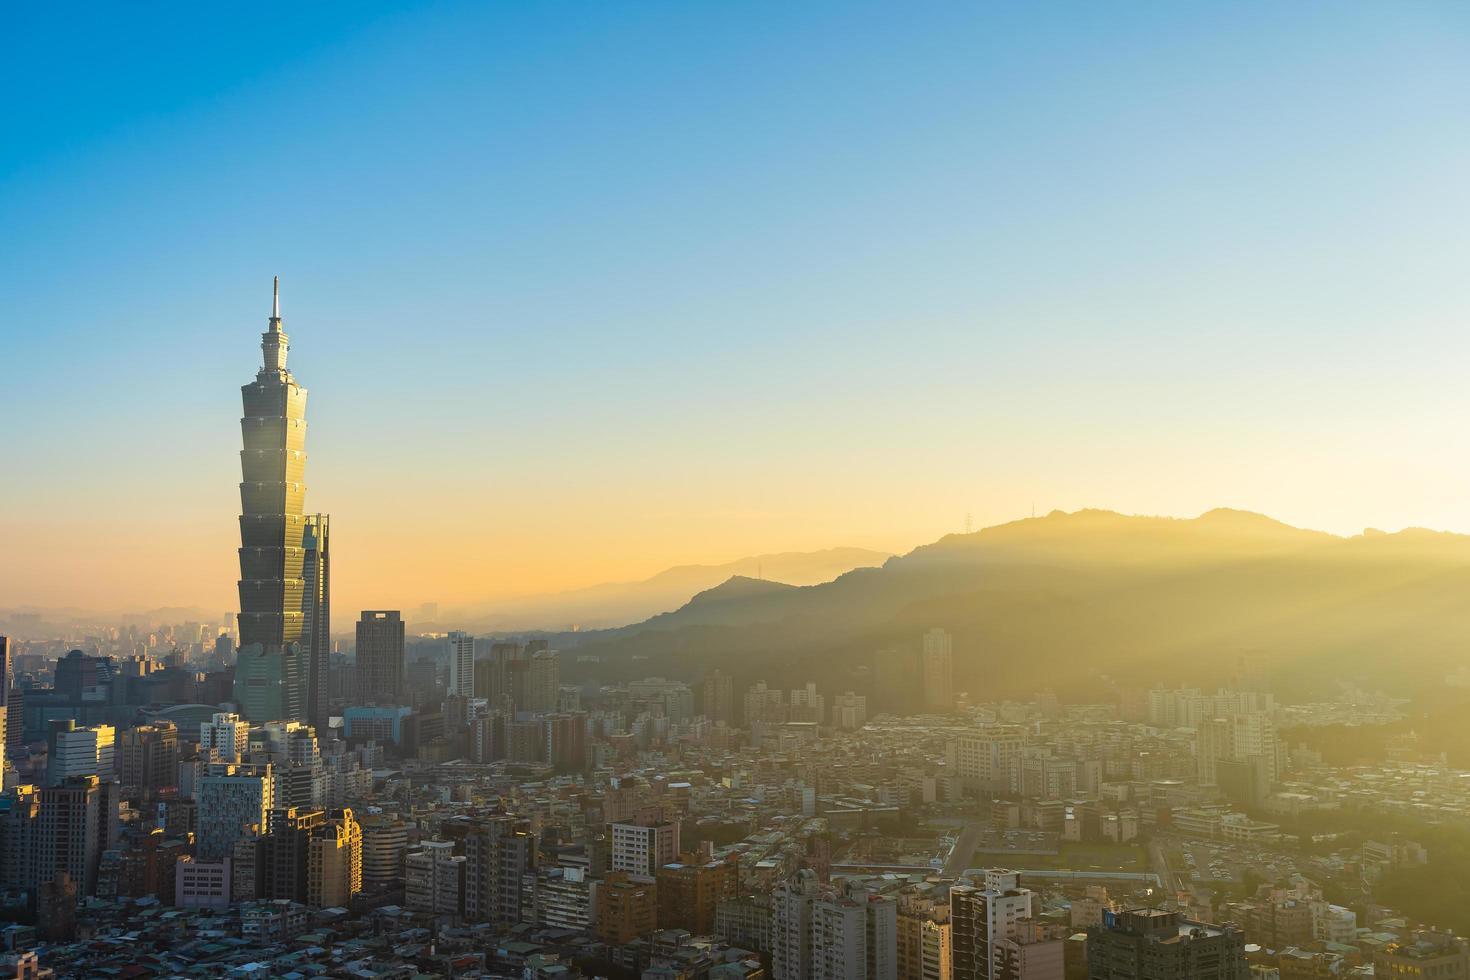 taipei 101 toren in de stad van taipei, taiwan foto